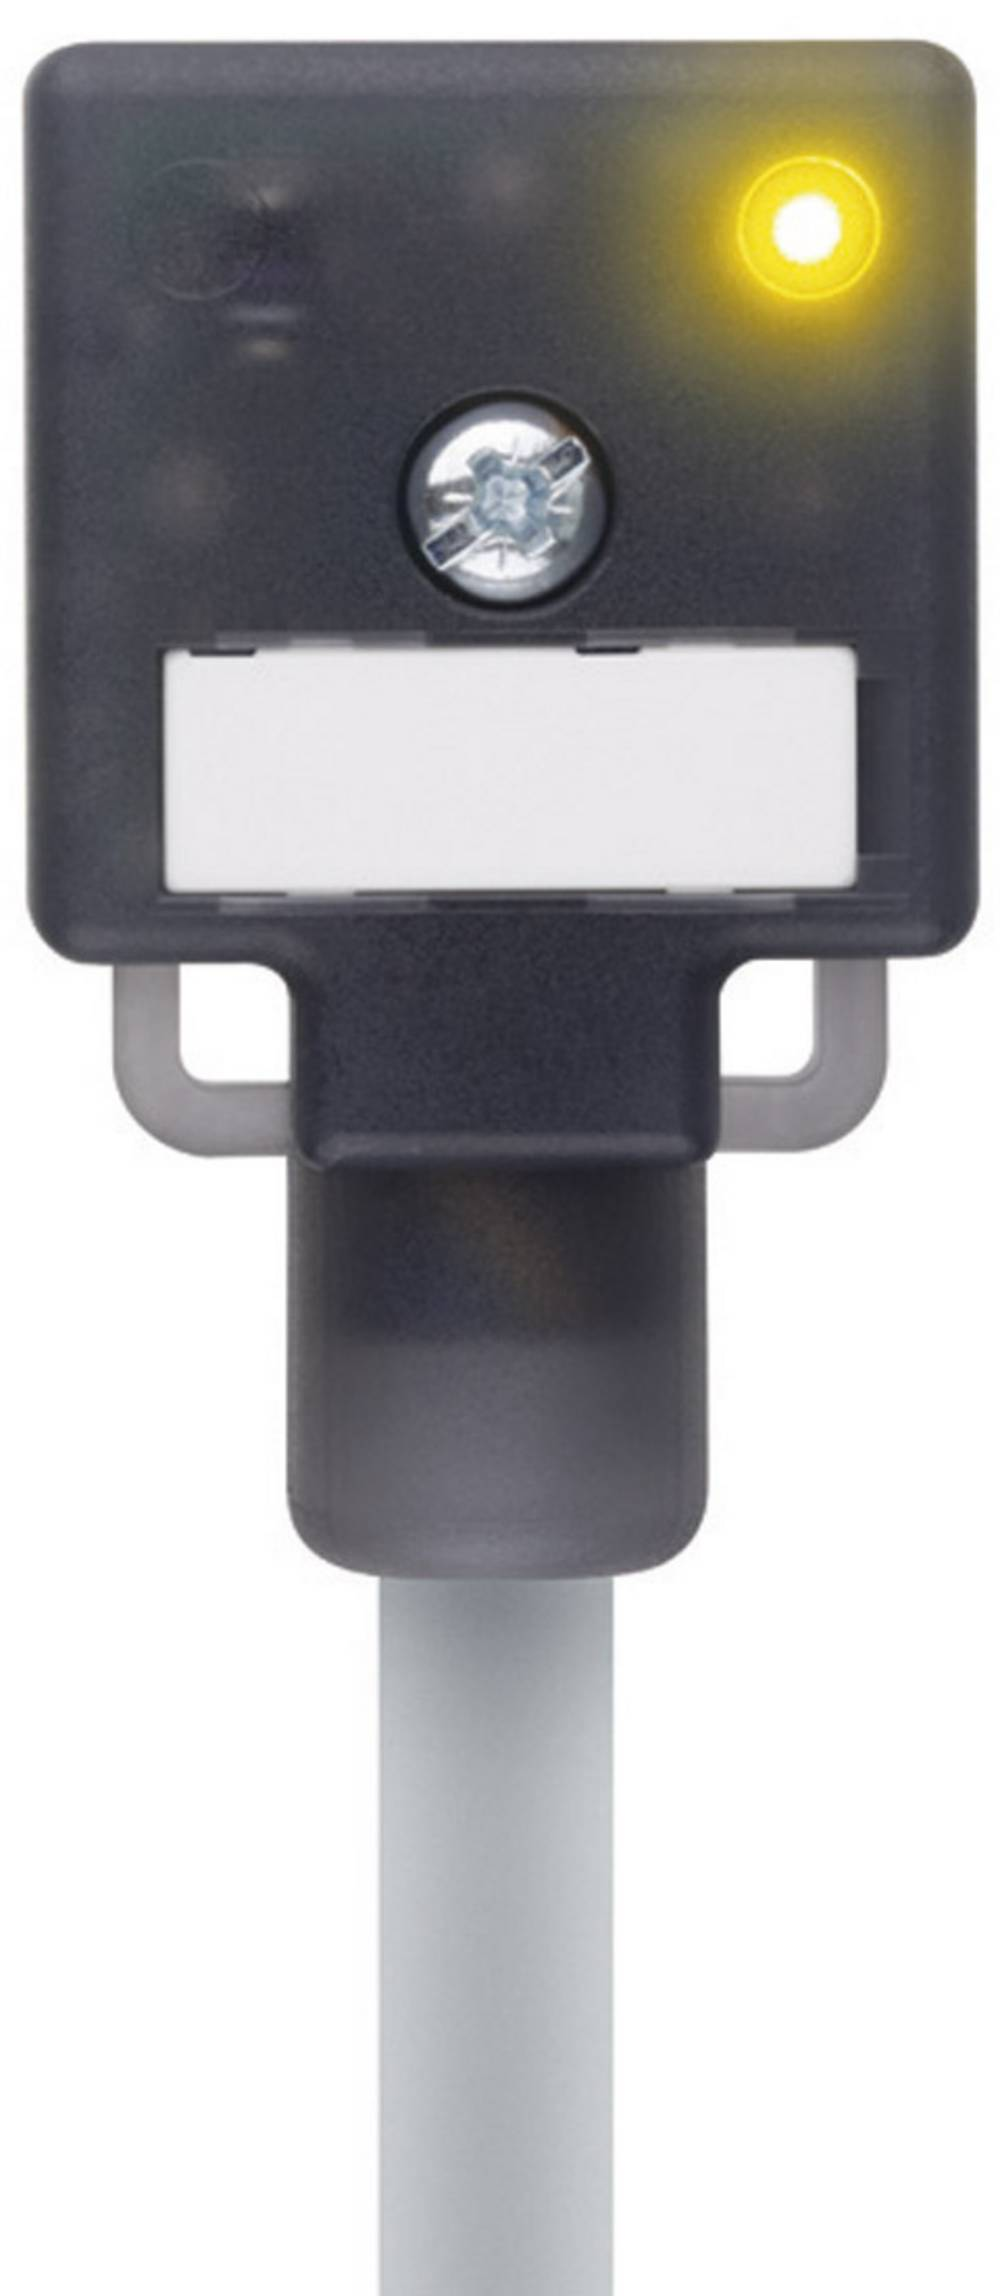 Valve stik konstruktionstype A Escha VA41-24.2-5/P01 Sort 1 stk